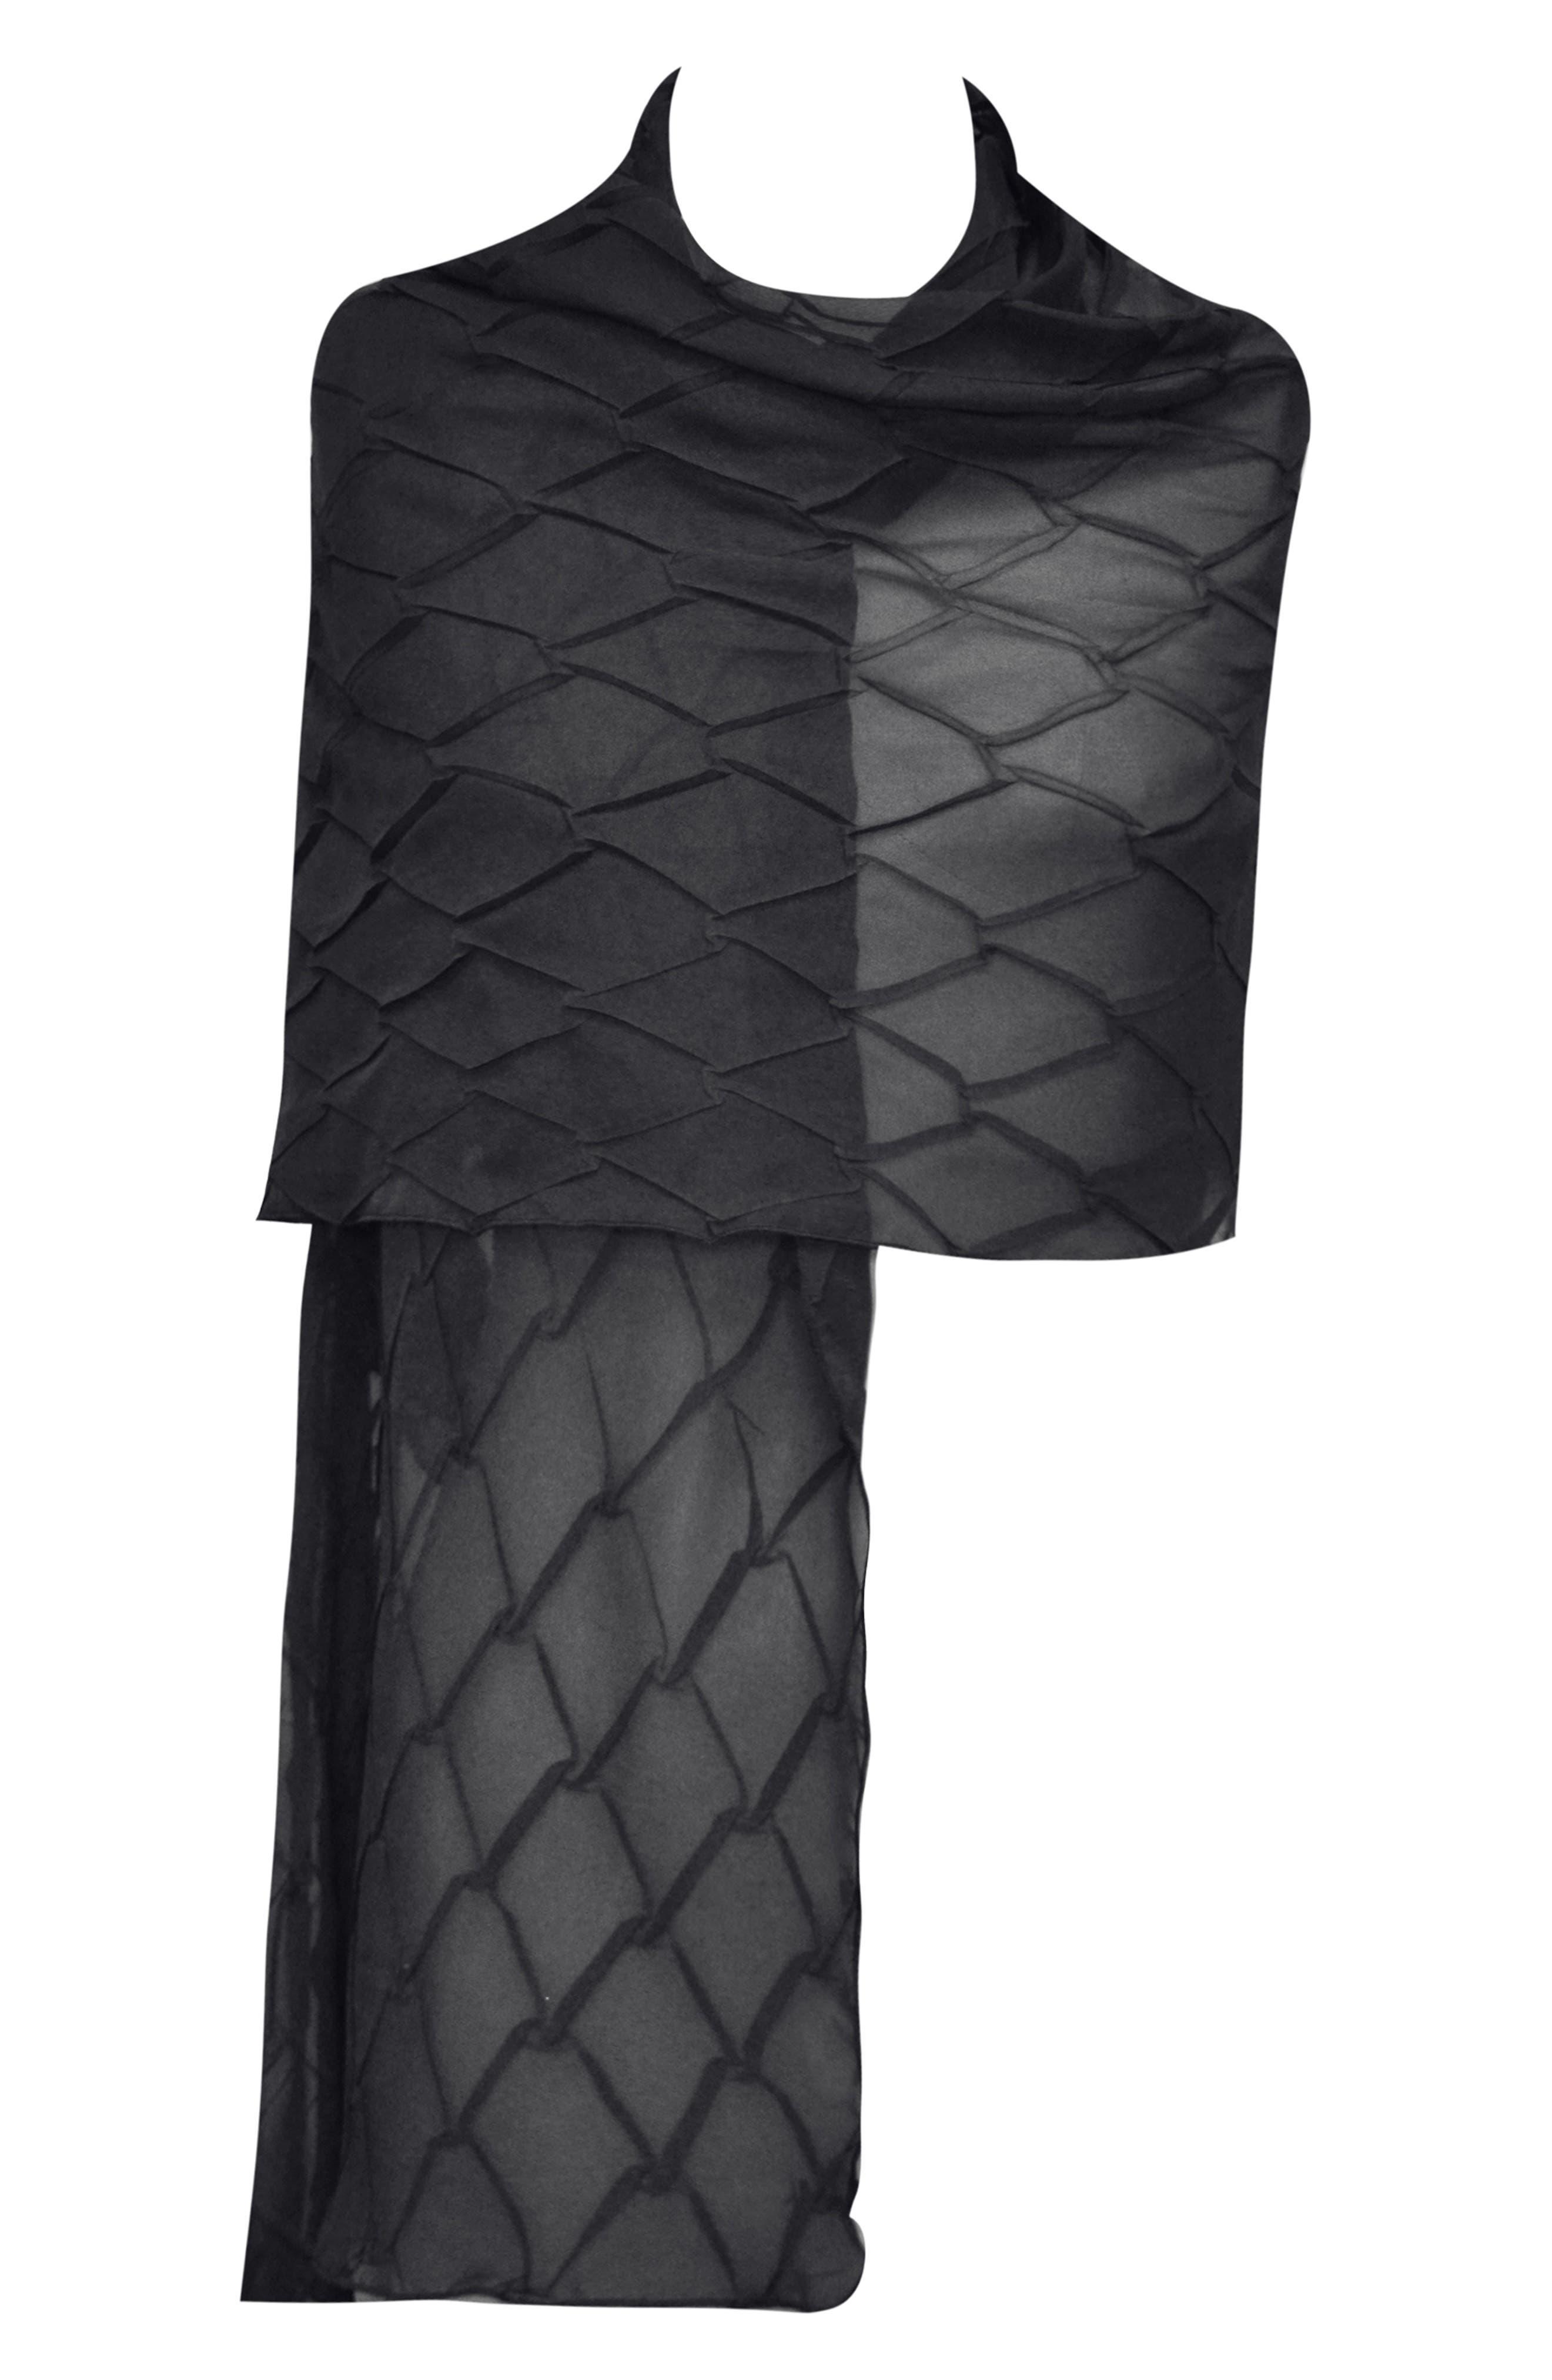 KOMAROV, Bead Trim Chiffon Dress with Wrap, Alternate thumbnail 8, color, BLACK